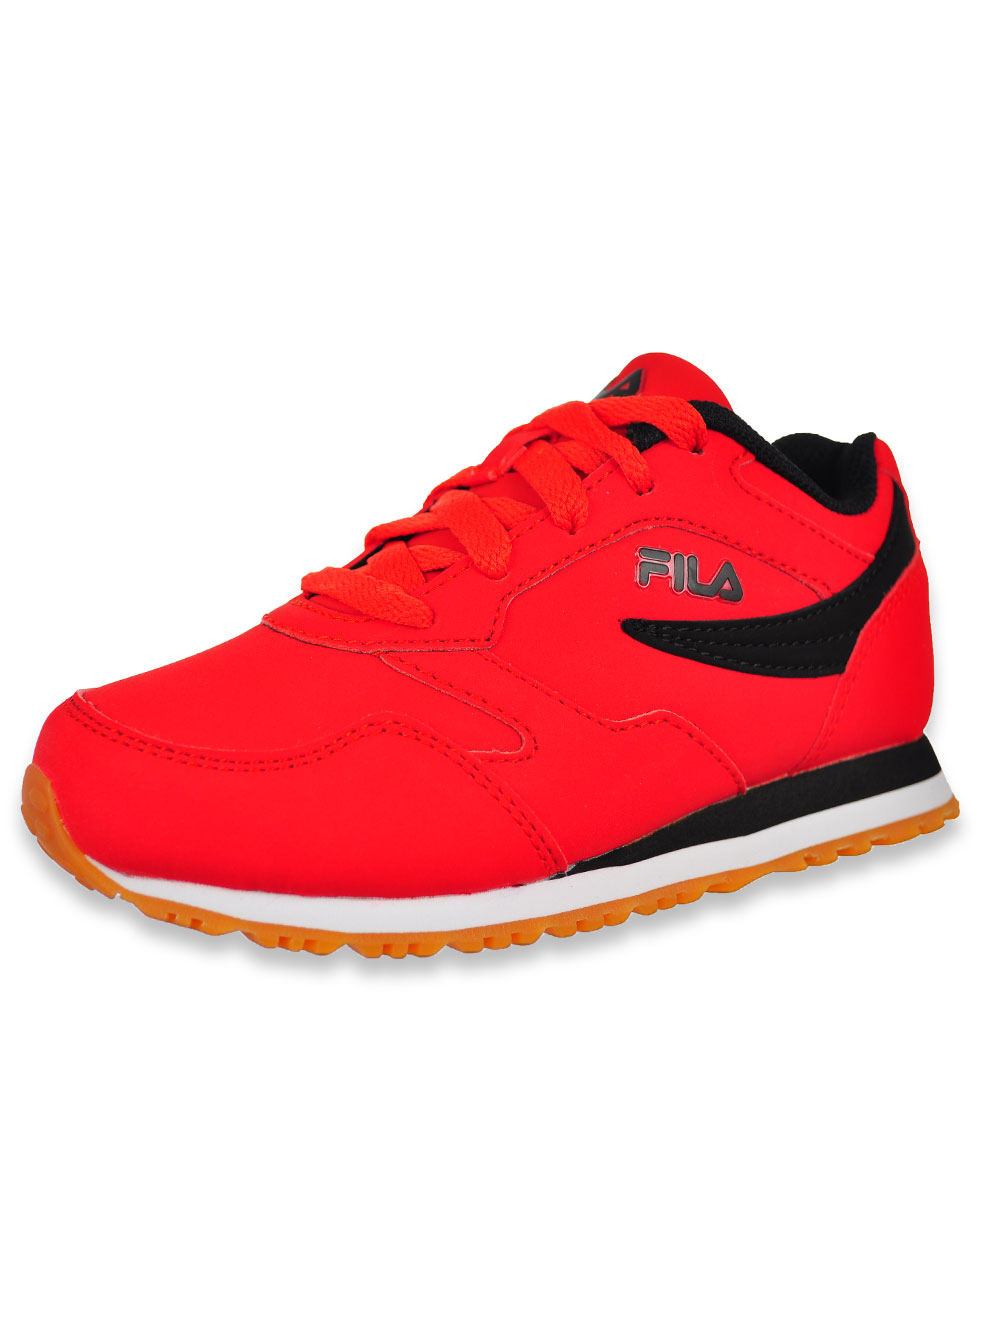 Boys' Classico FB Sneakers by Fila in Redblackwhite